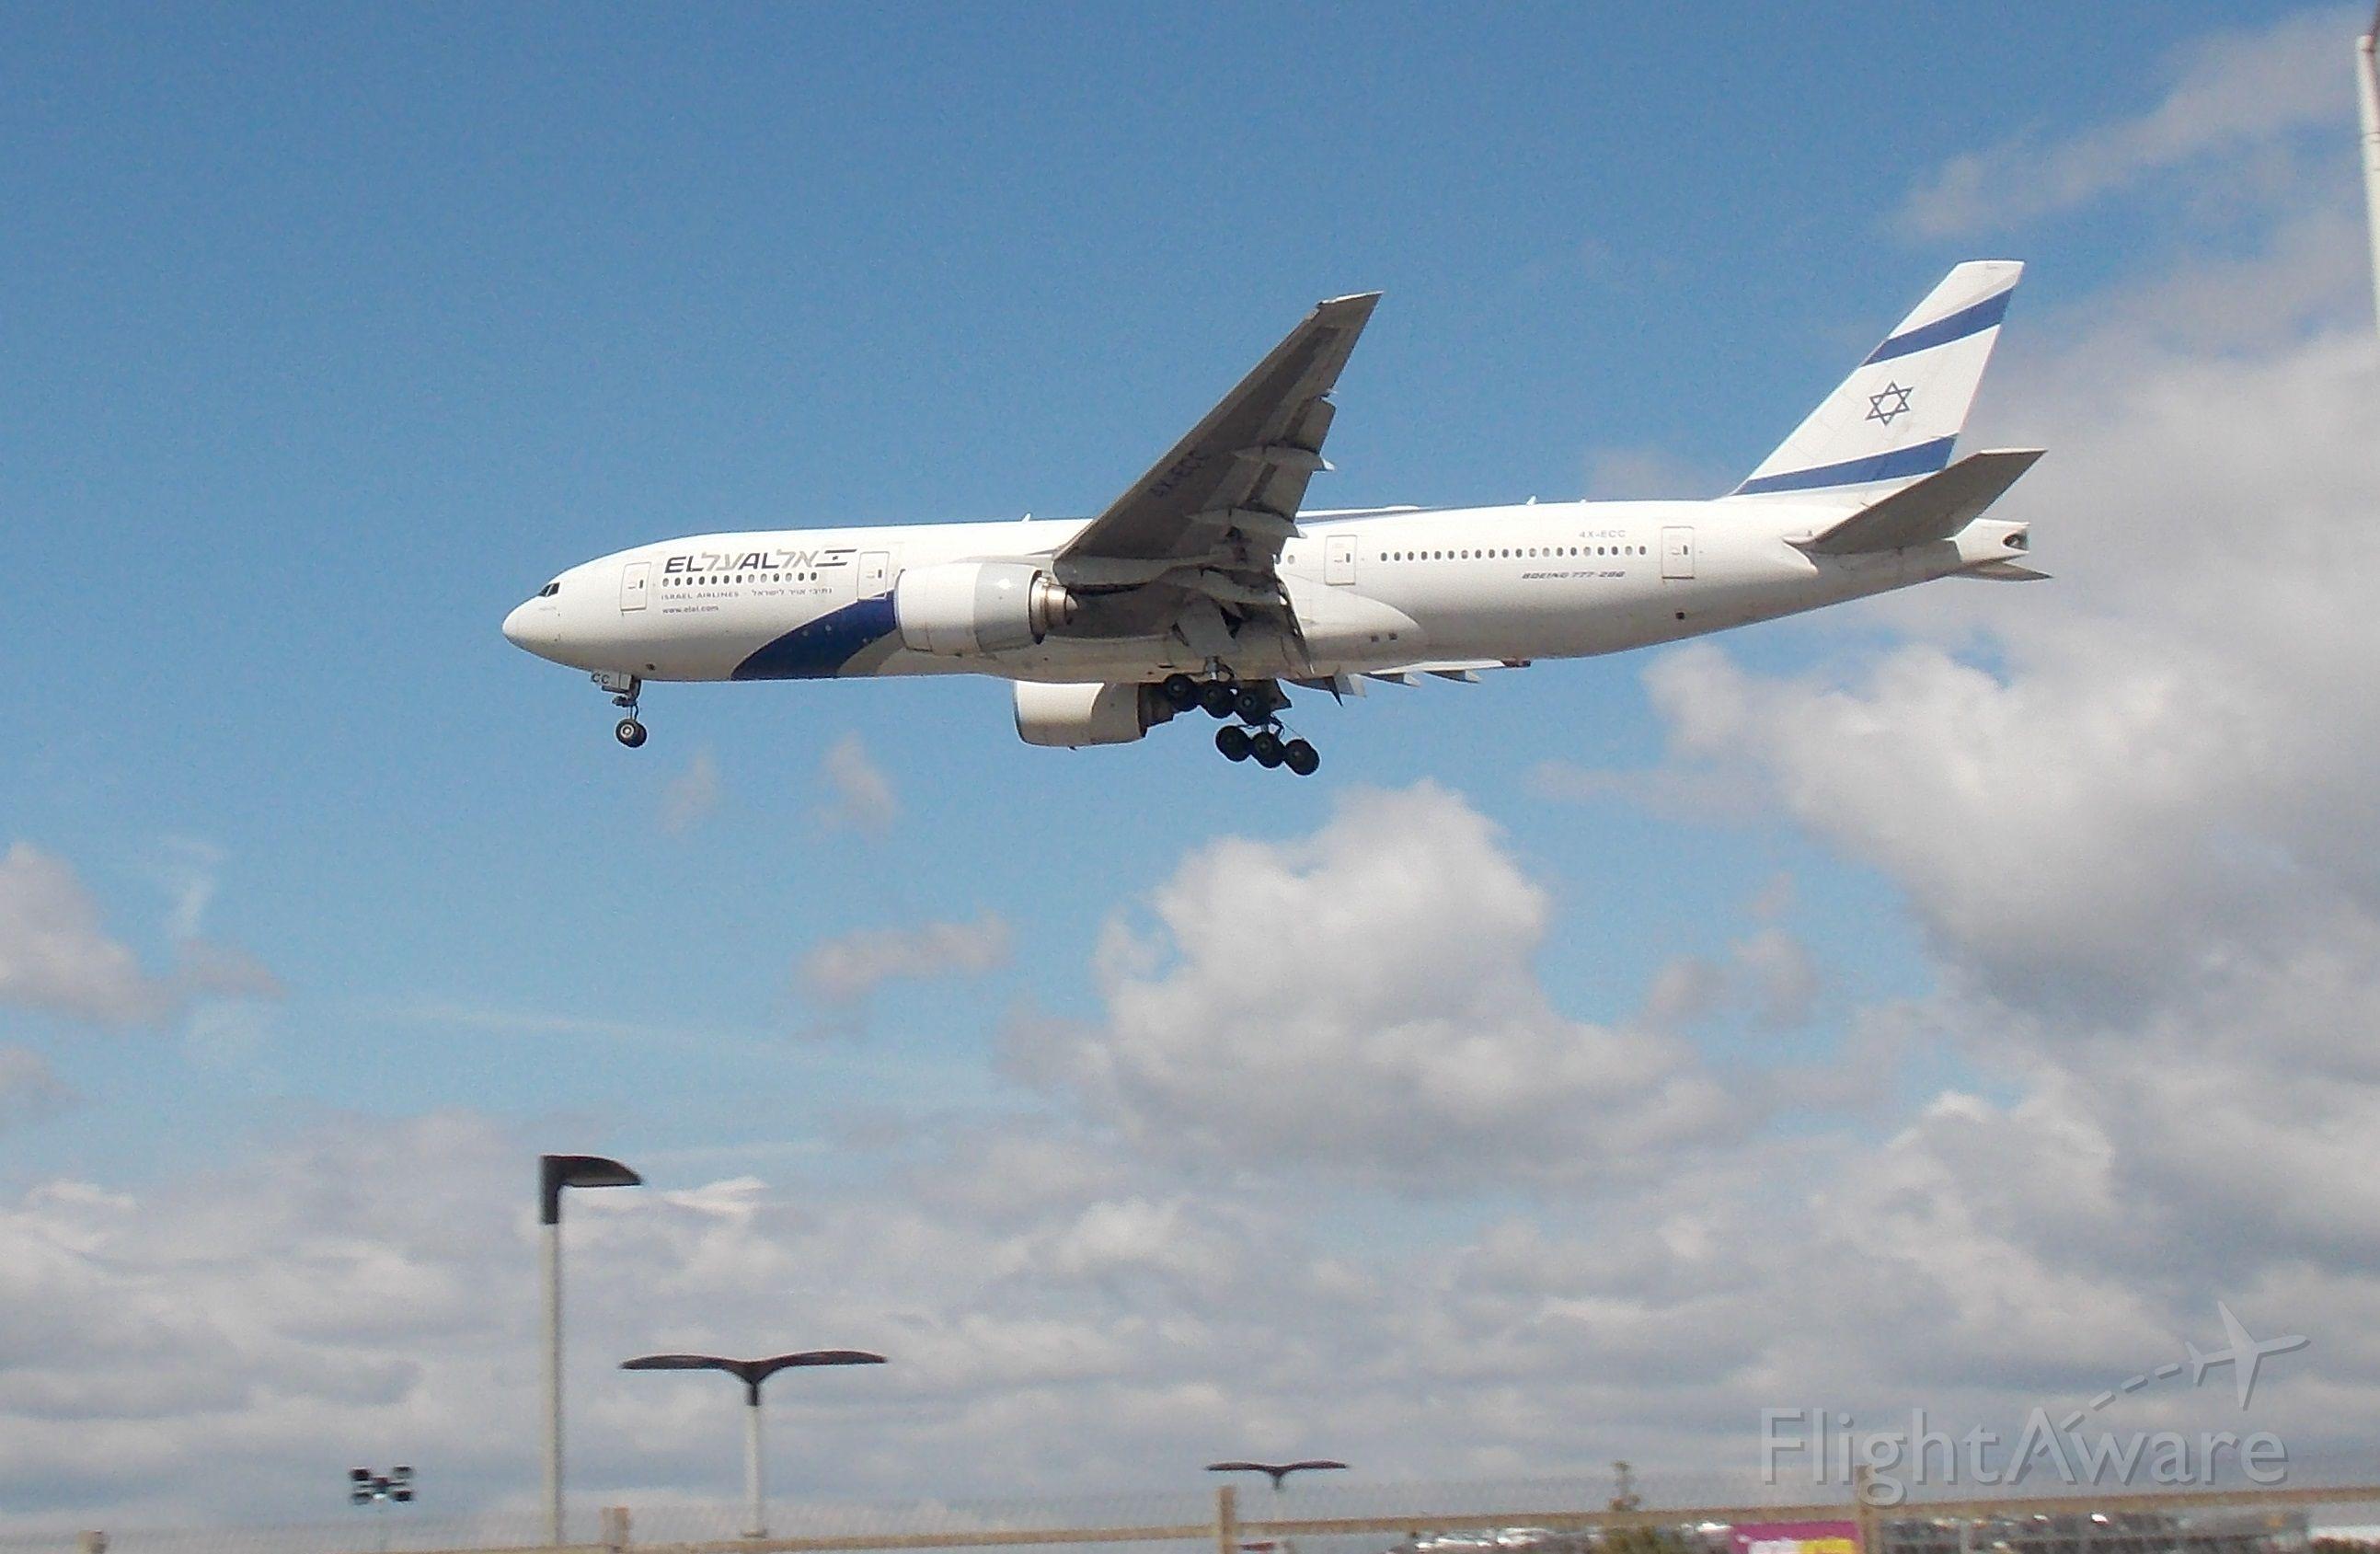 Boeing 777-200 (4X-ECC)